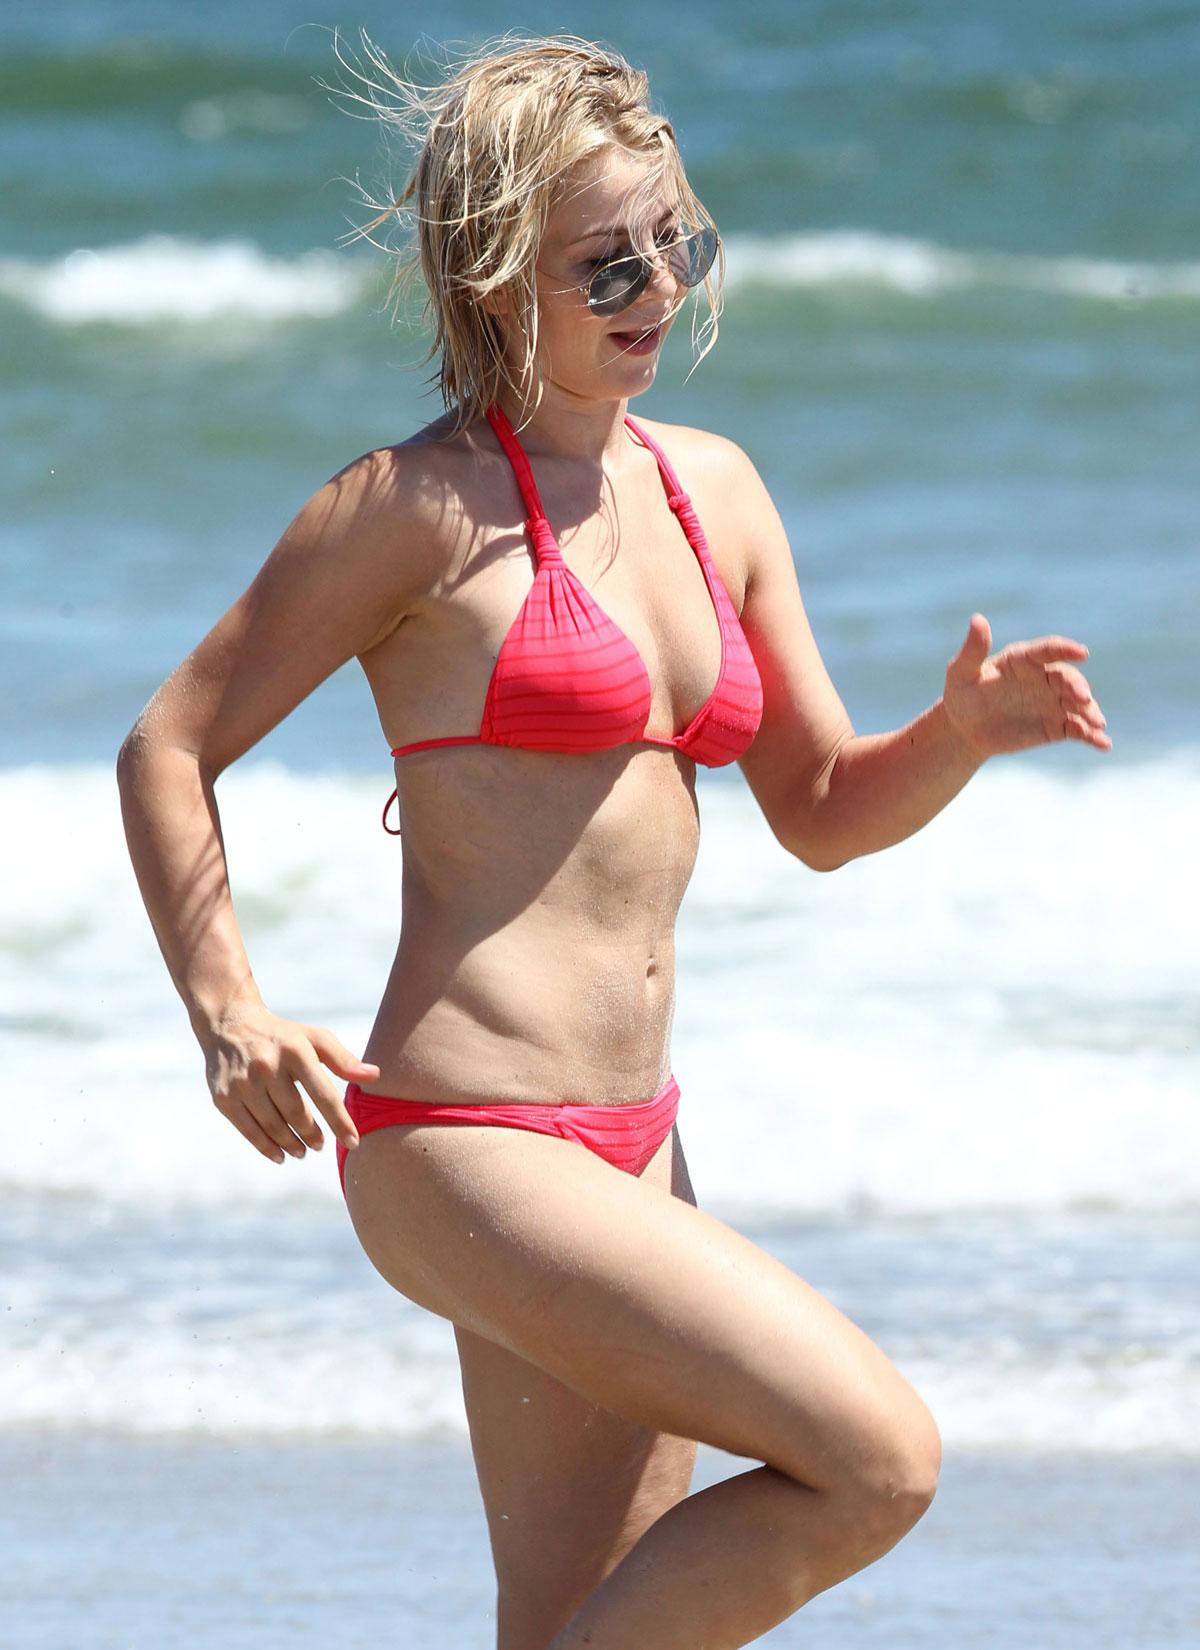 Kure beach bikinis